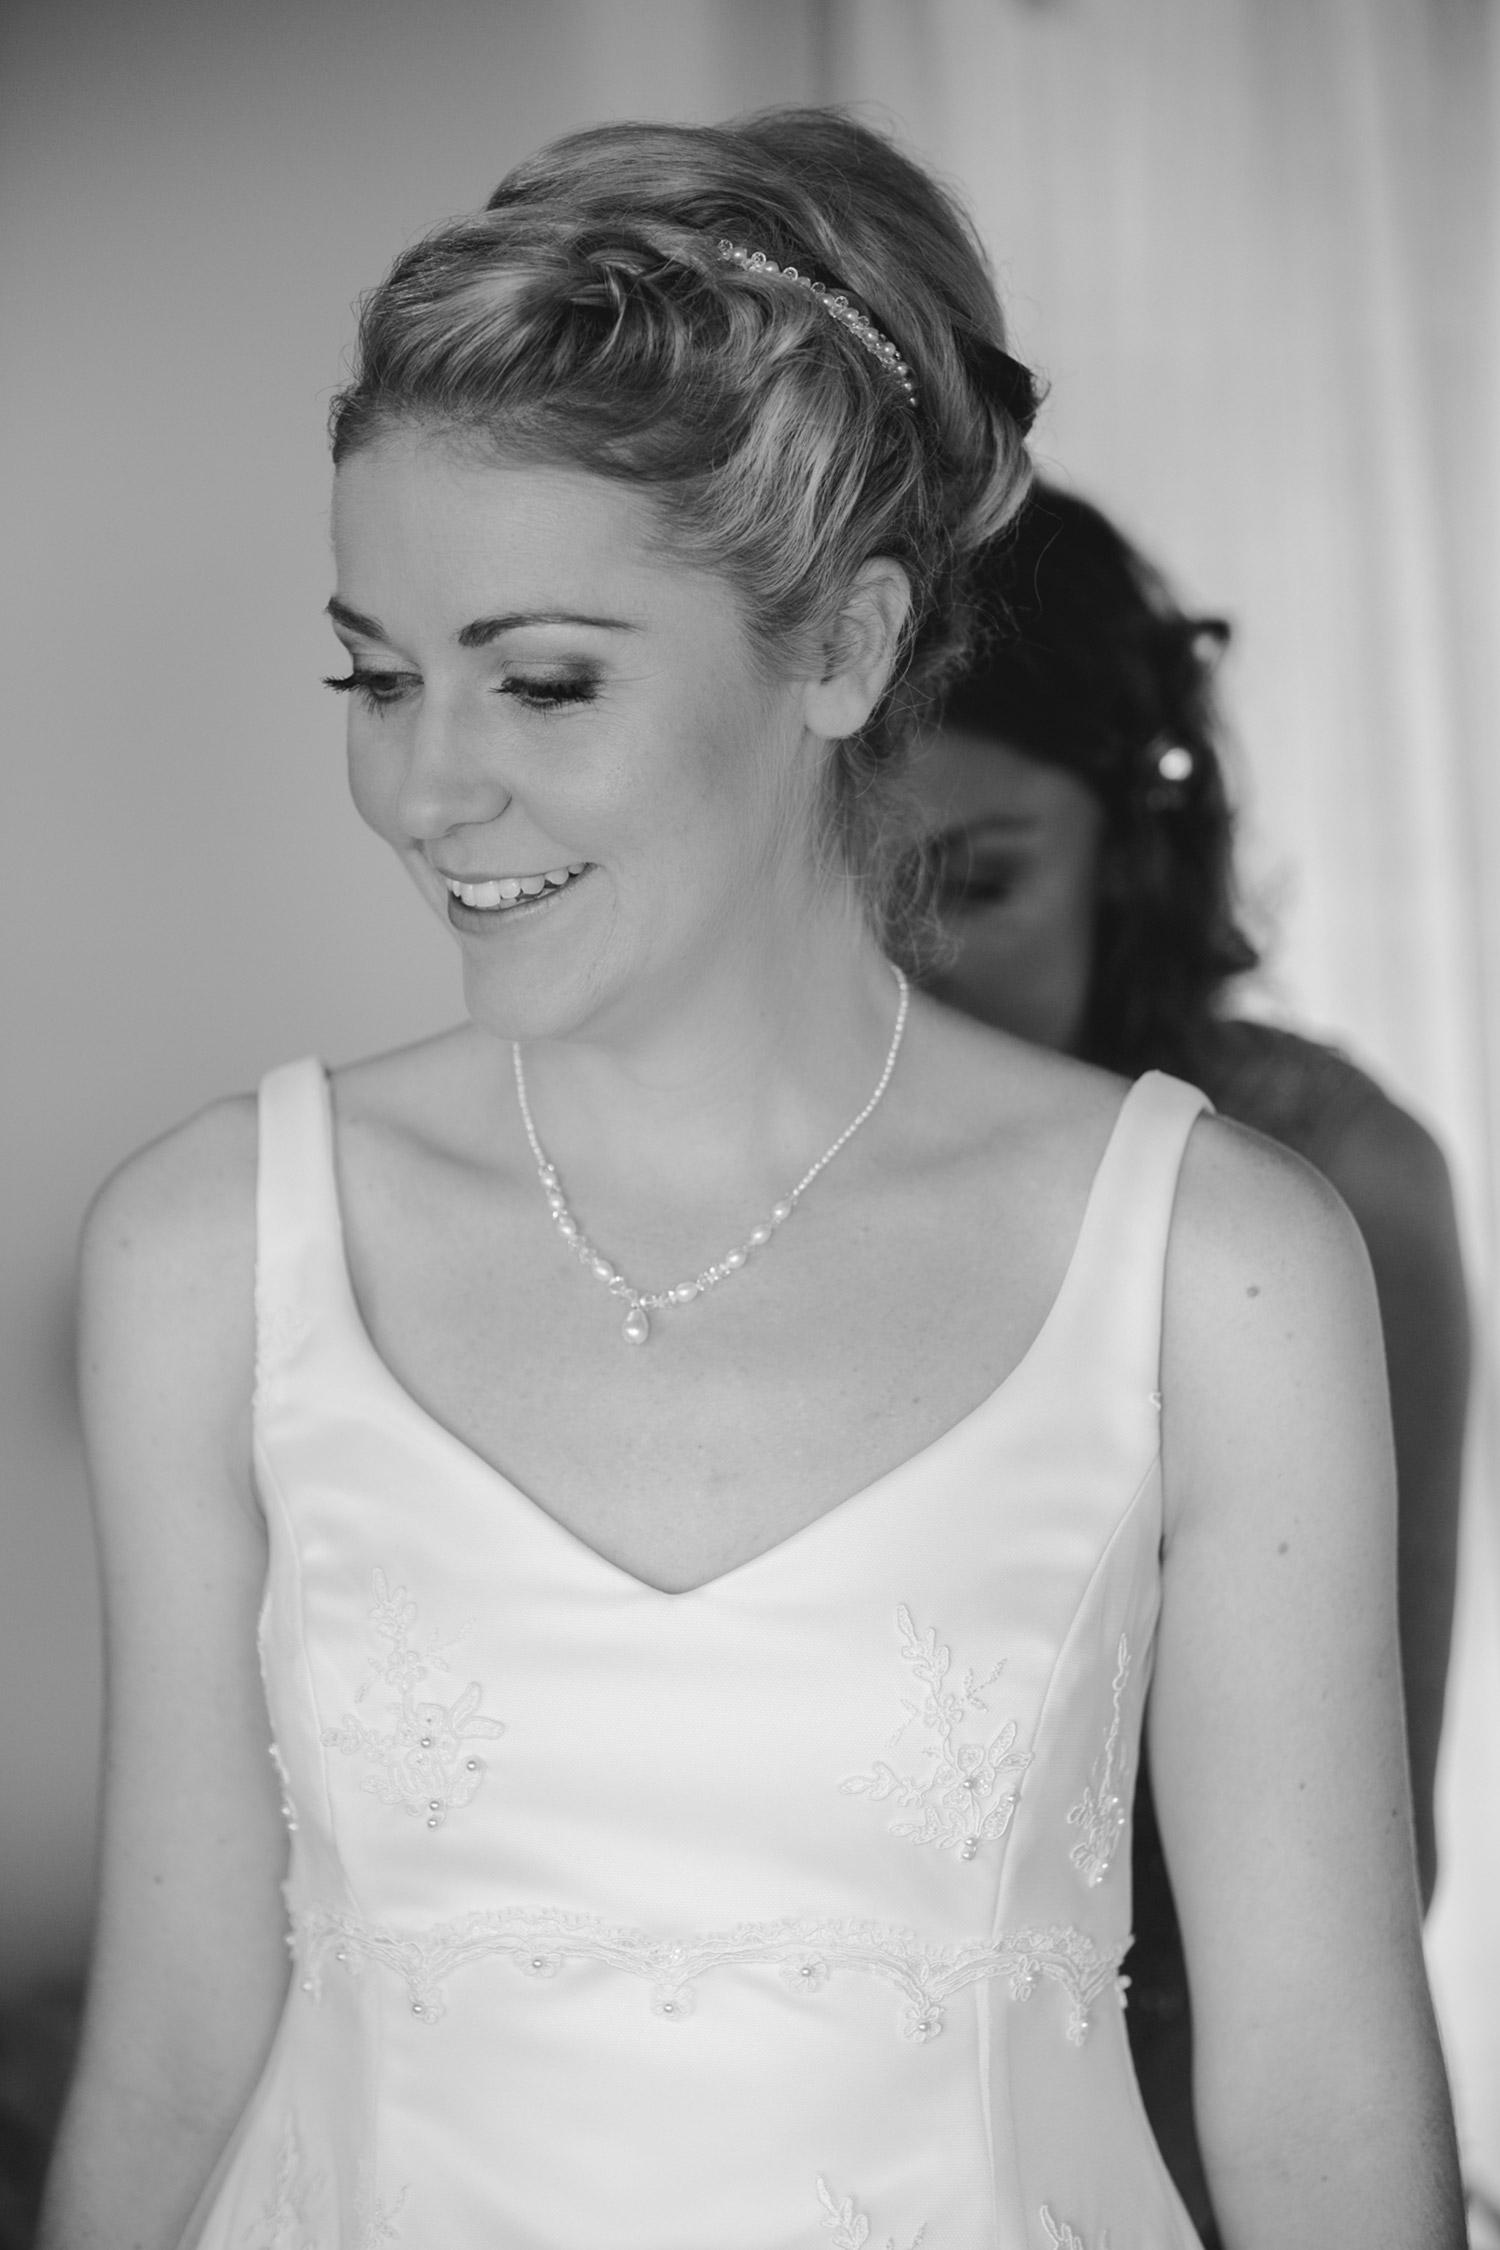 sunshine-coast-wedding-photographer-all-the-love-in-the-world-noosa-mooloolaba-glasshouse-brisbane-nat-jon-006.jpg